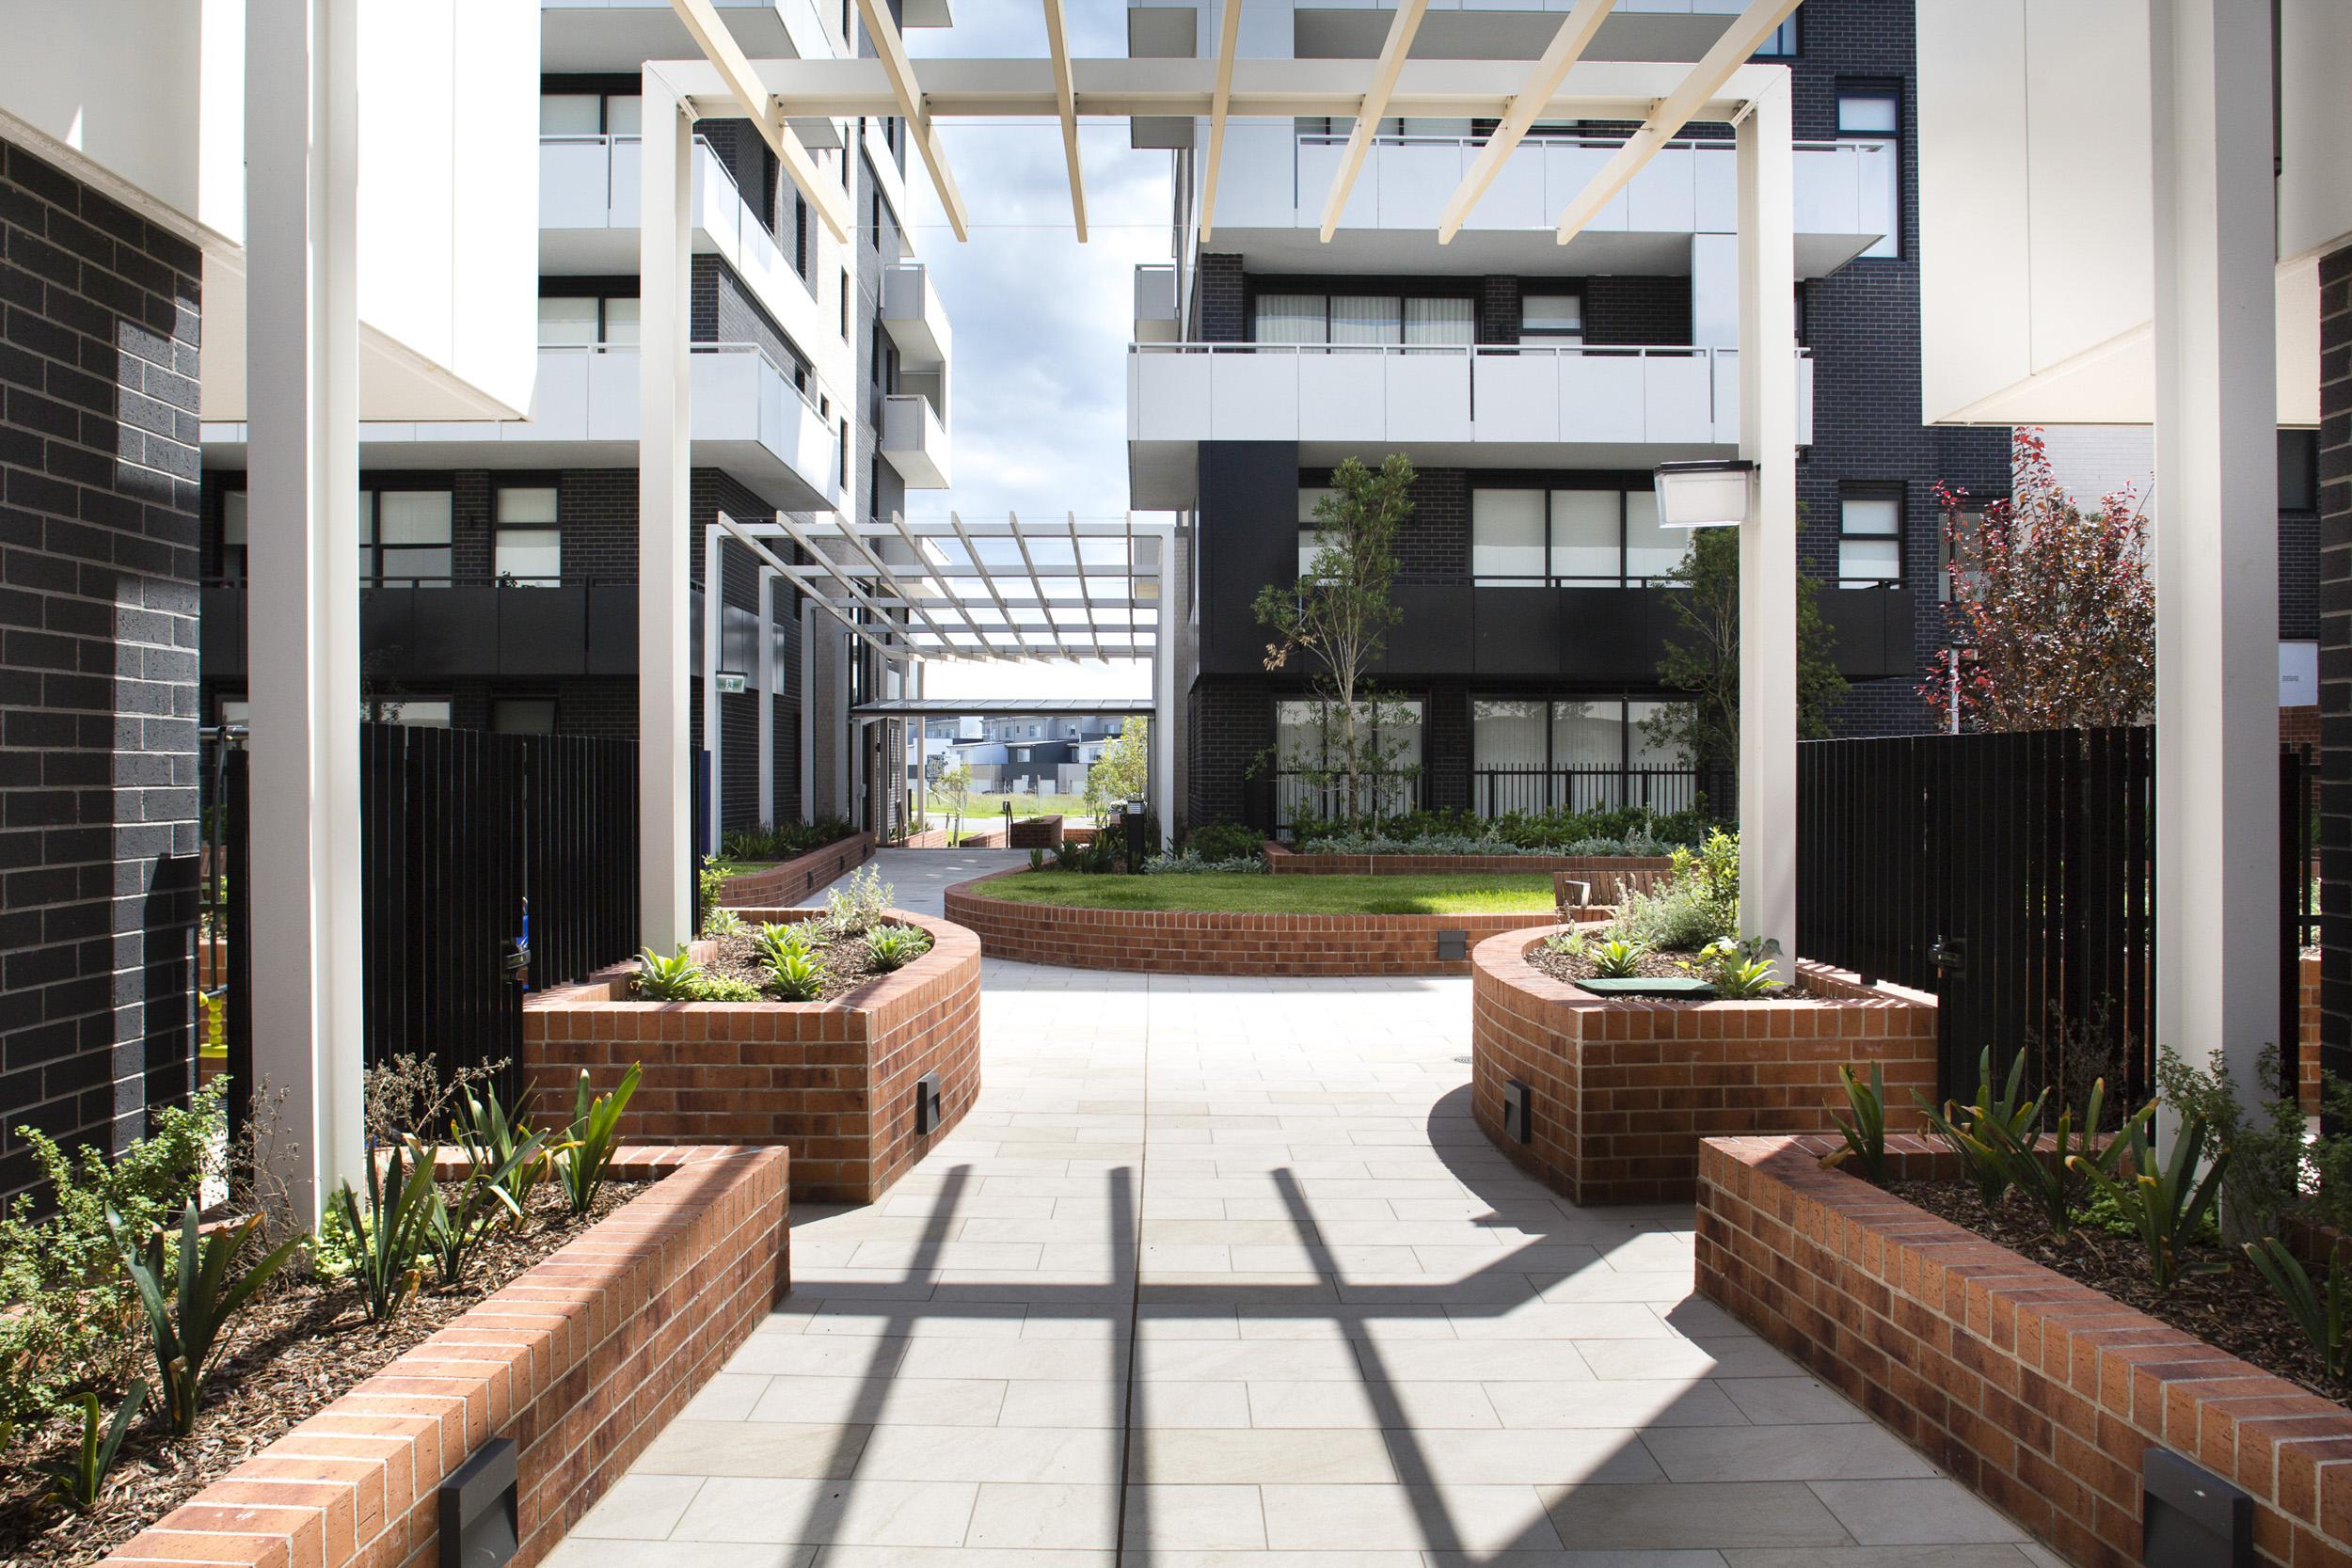 architecture_photography_sydney_australia_36.jpg